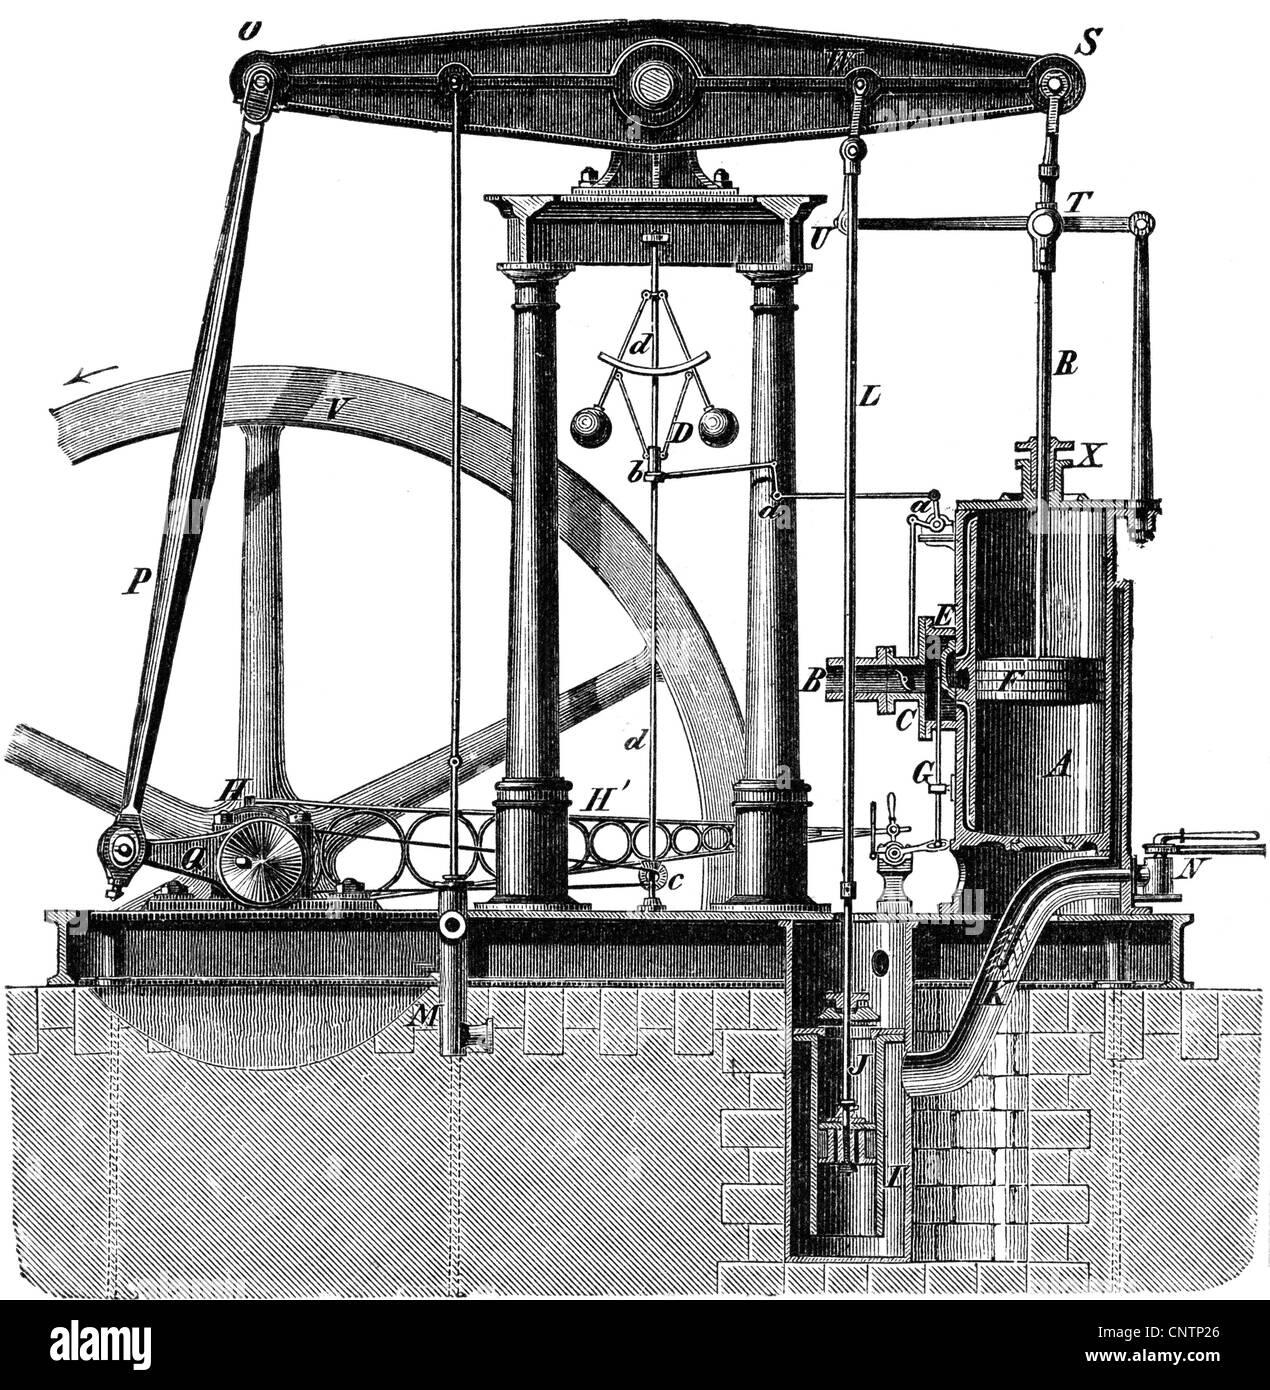 james watt steam engine diagram loncin 110 quad wiring stock photos and